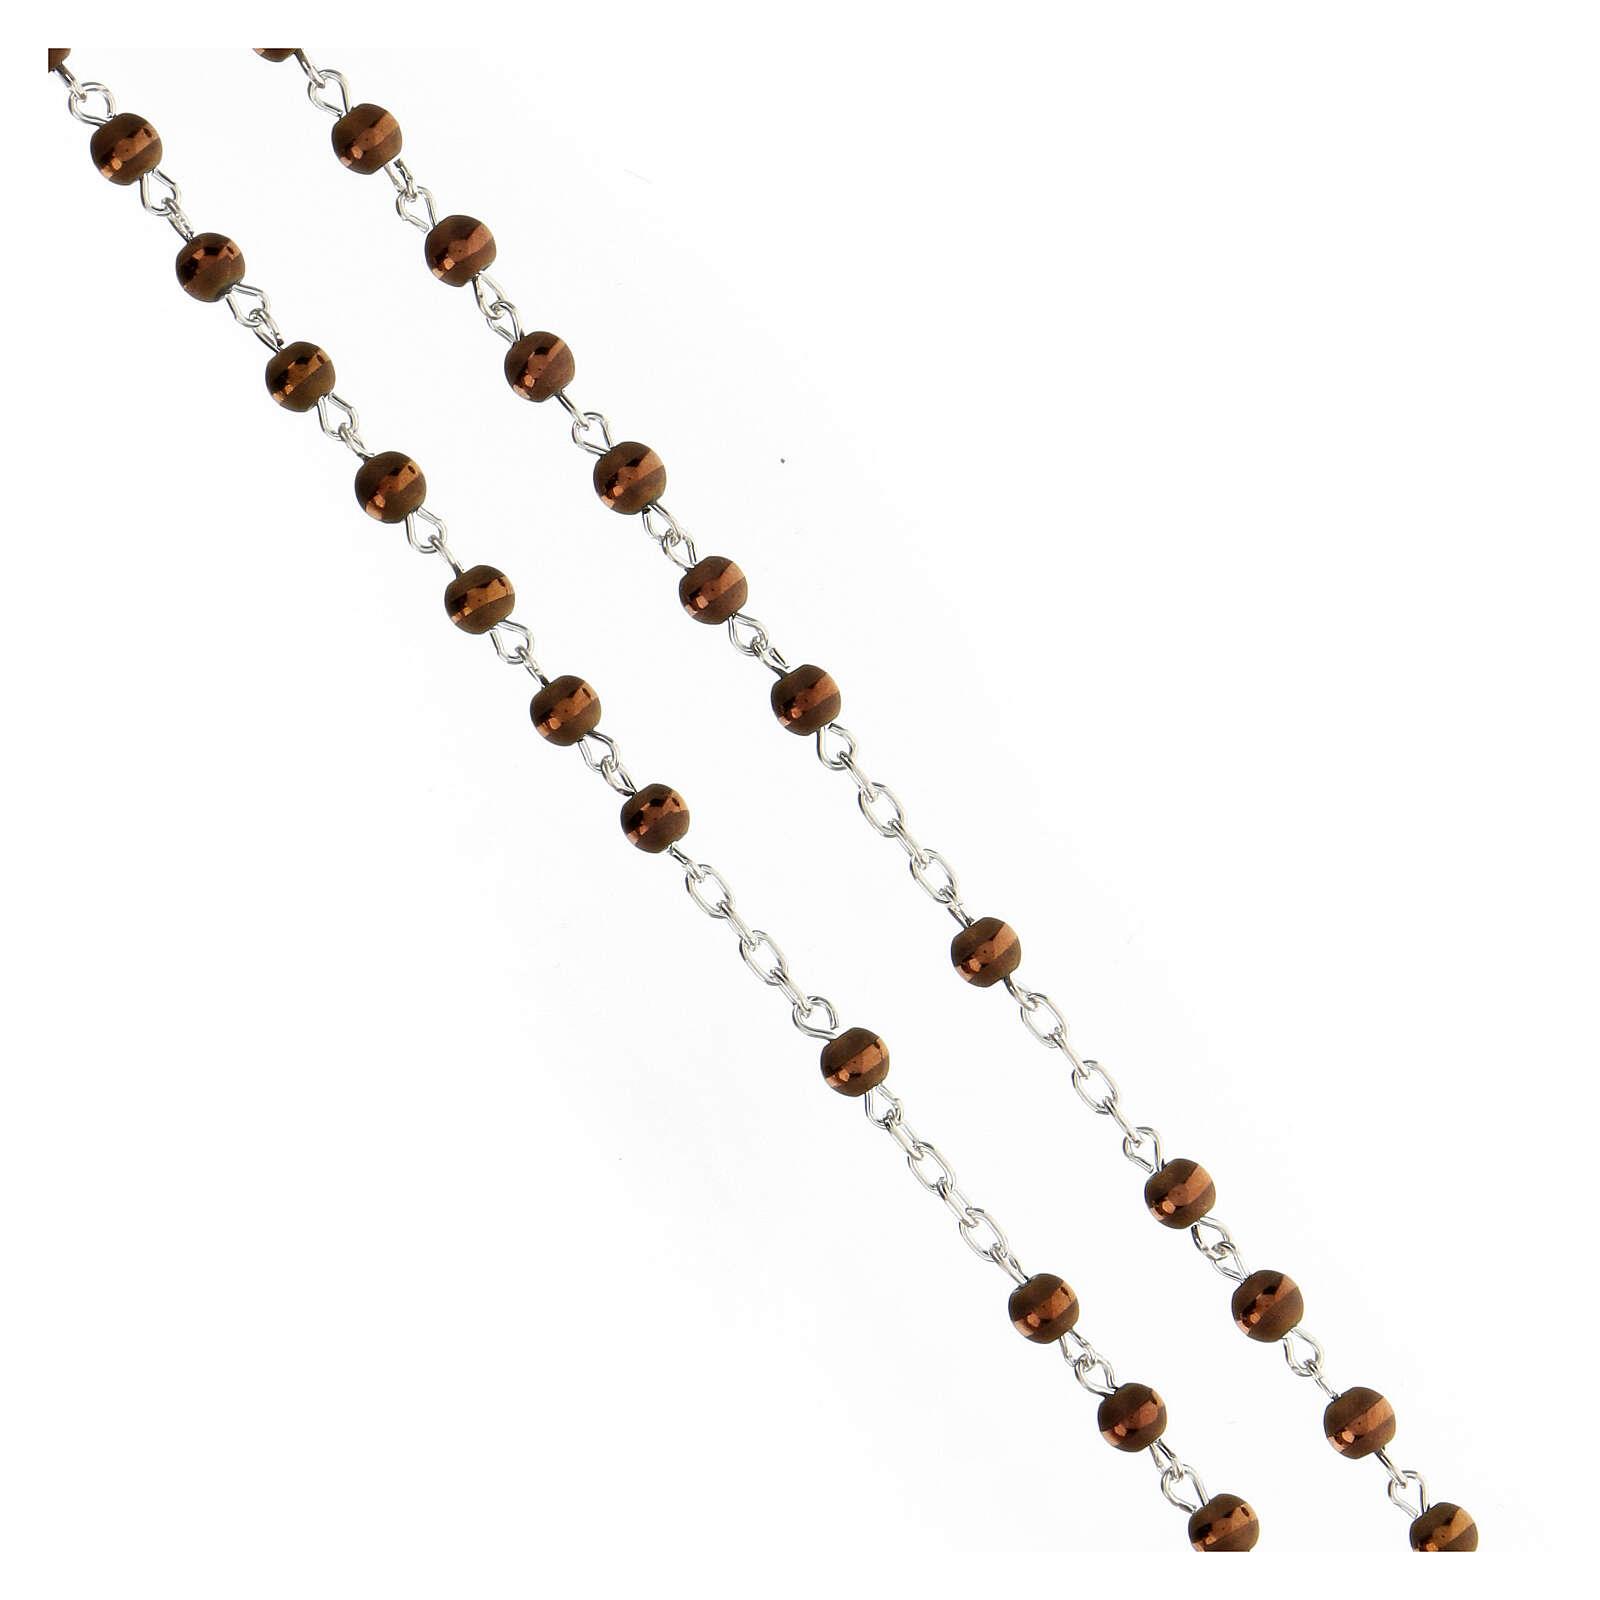 Rosario plata 925 granos hematites marrón 4 mm opaco raya lúcida 4